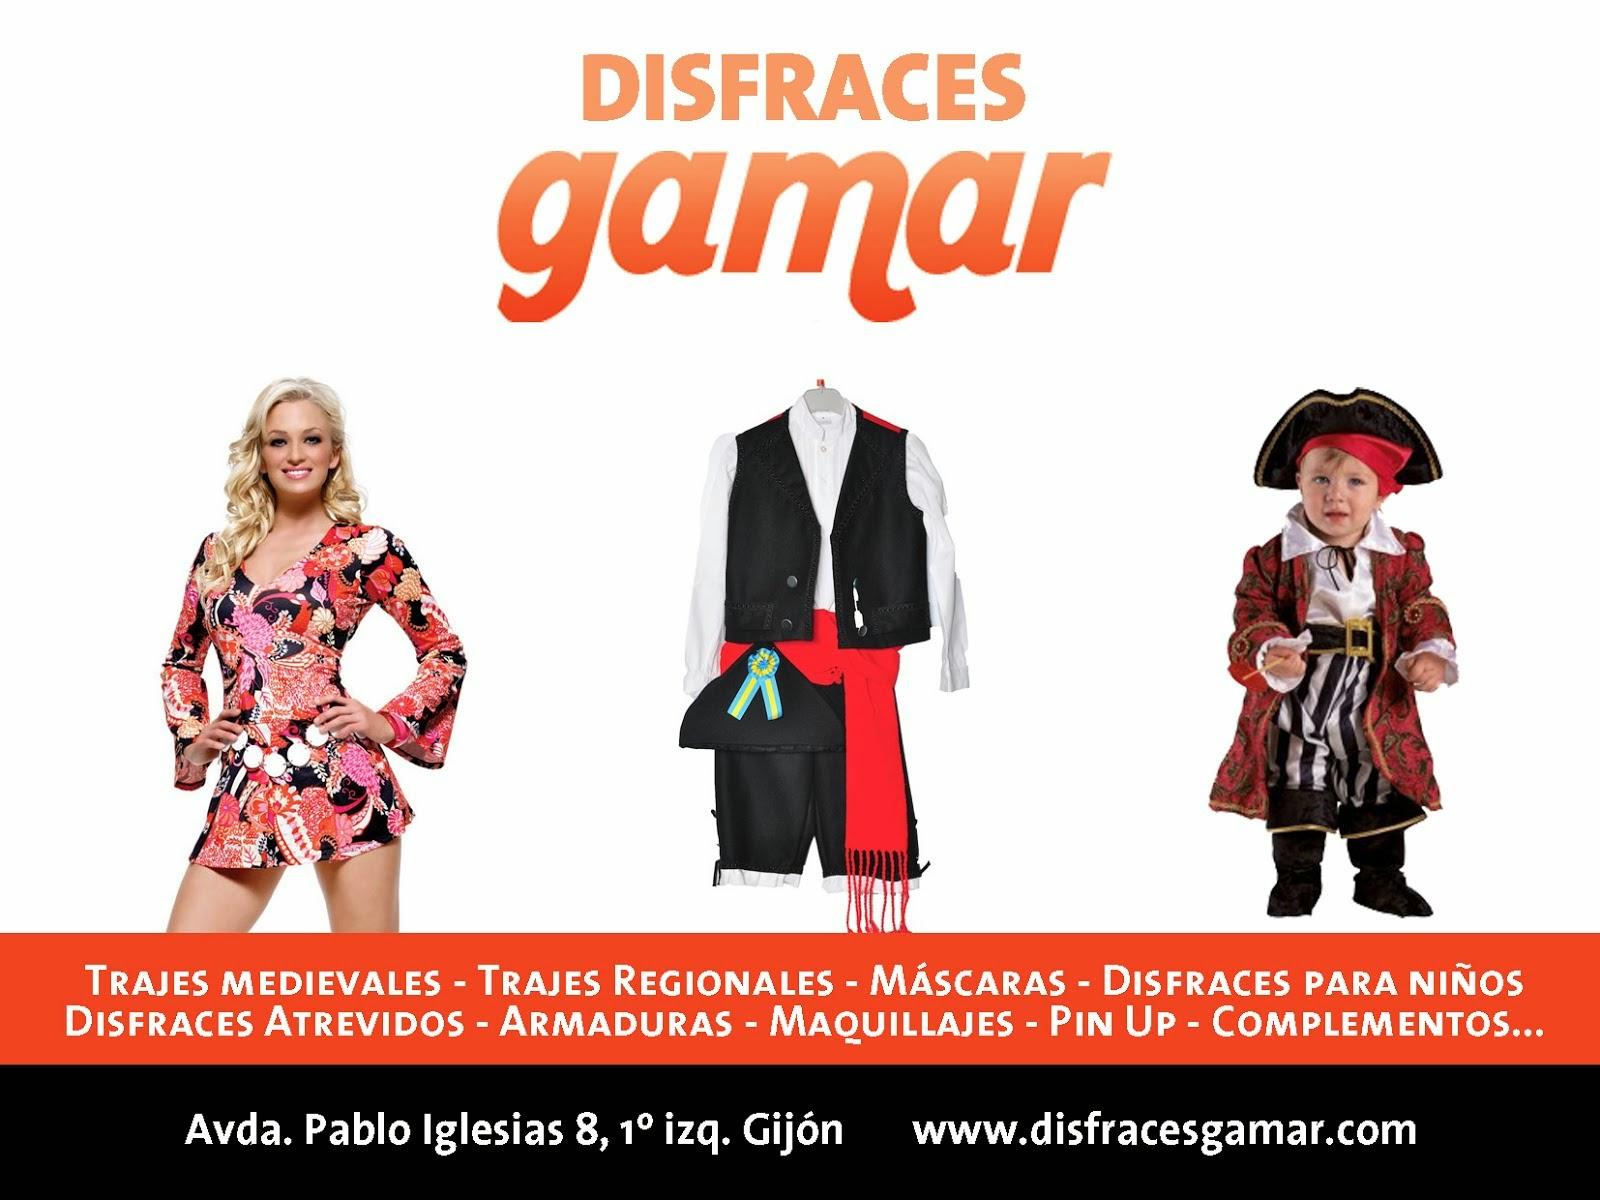 Disfraces Gamar